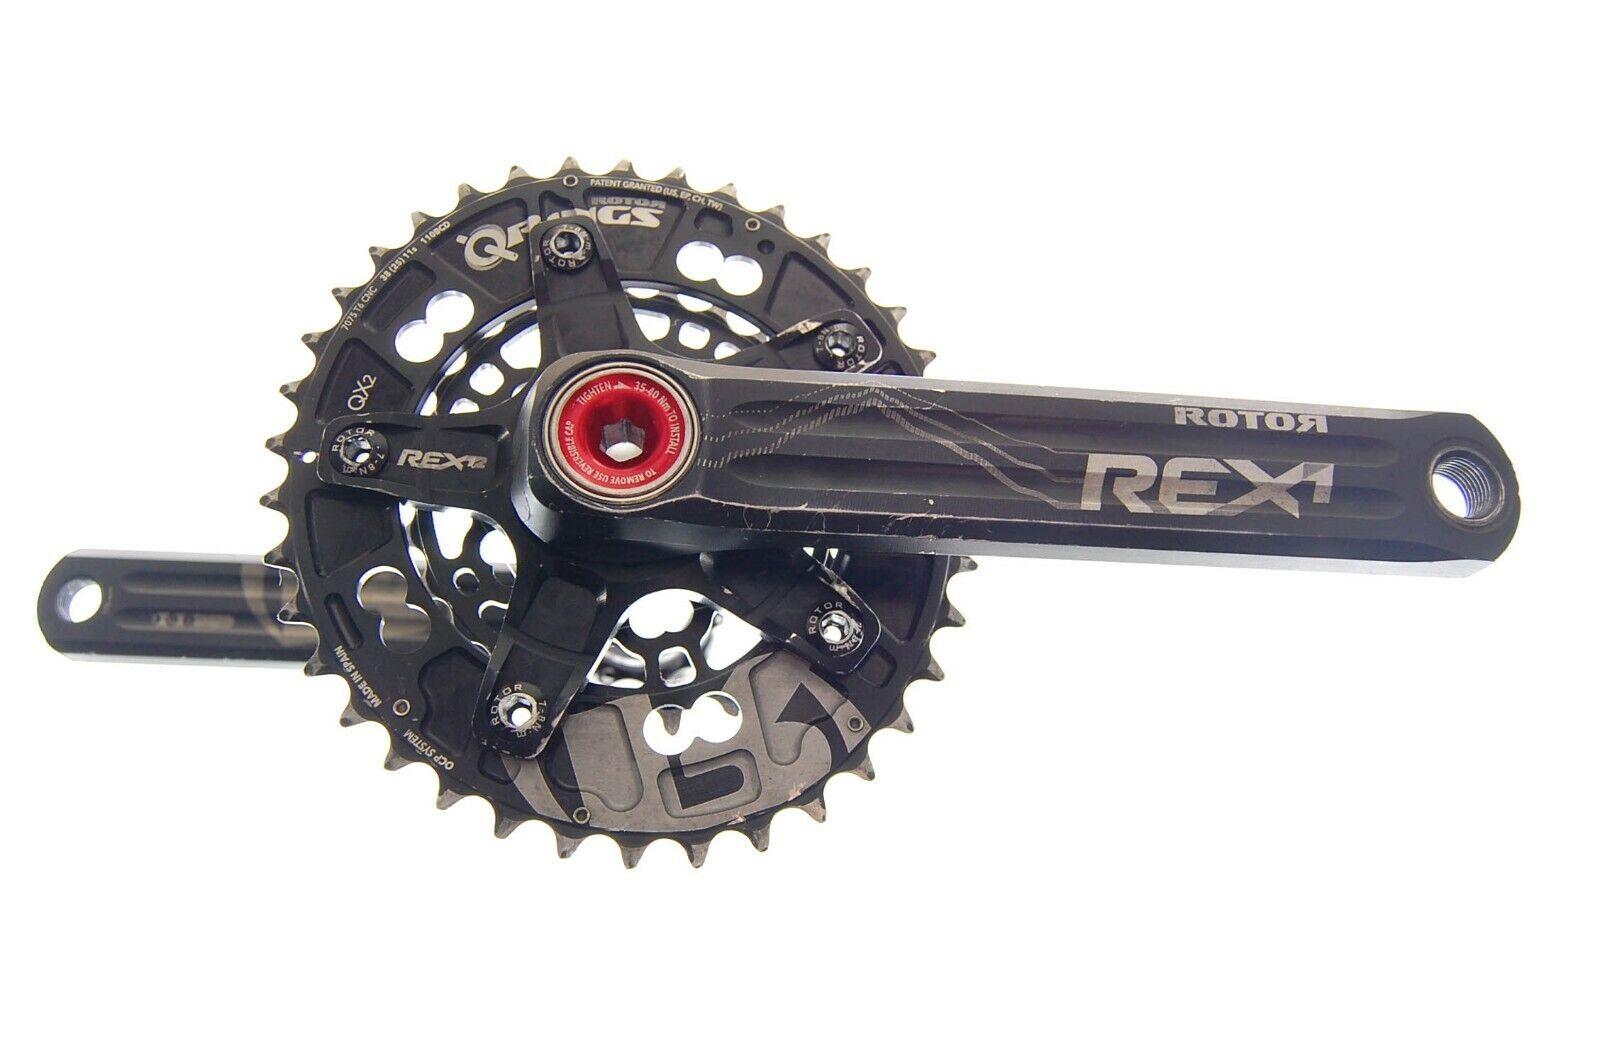 Crankset rotor rex 1.2 rotor qrings dishes (Crankset) (s n b05806)